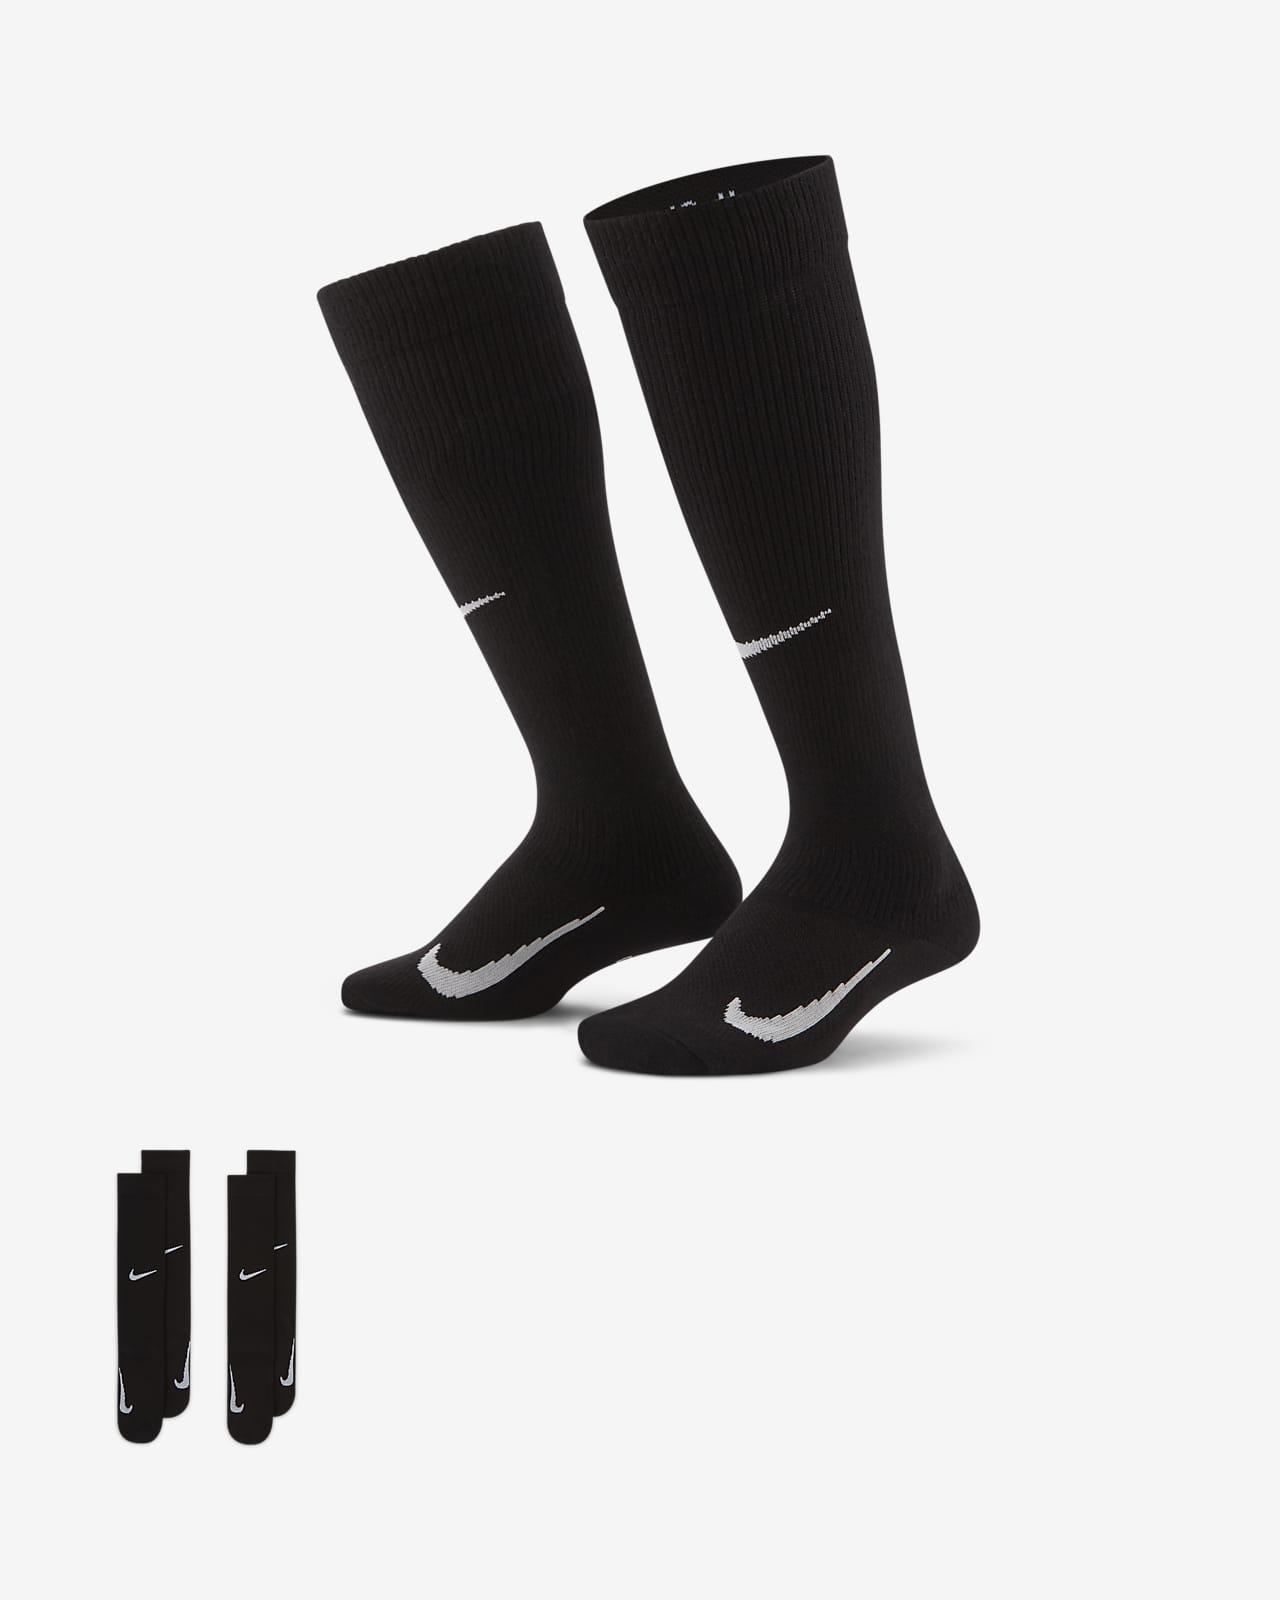 Calzettoni Nike Swoosh - Bambini (2 paia)